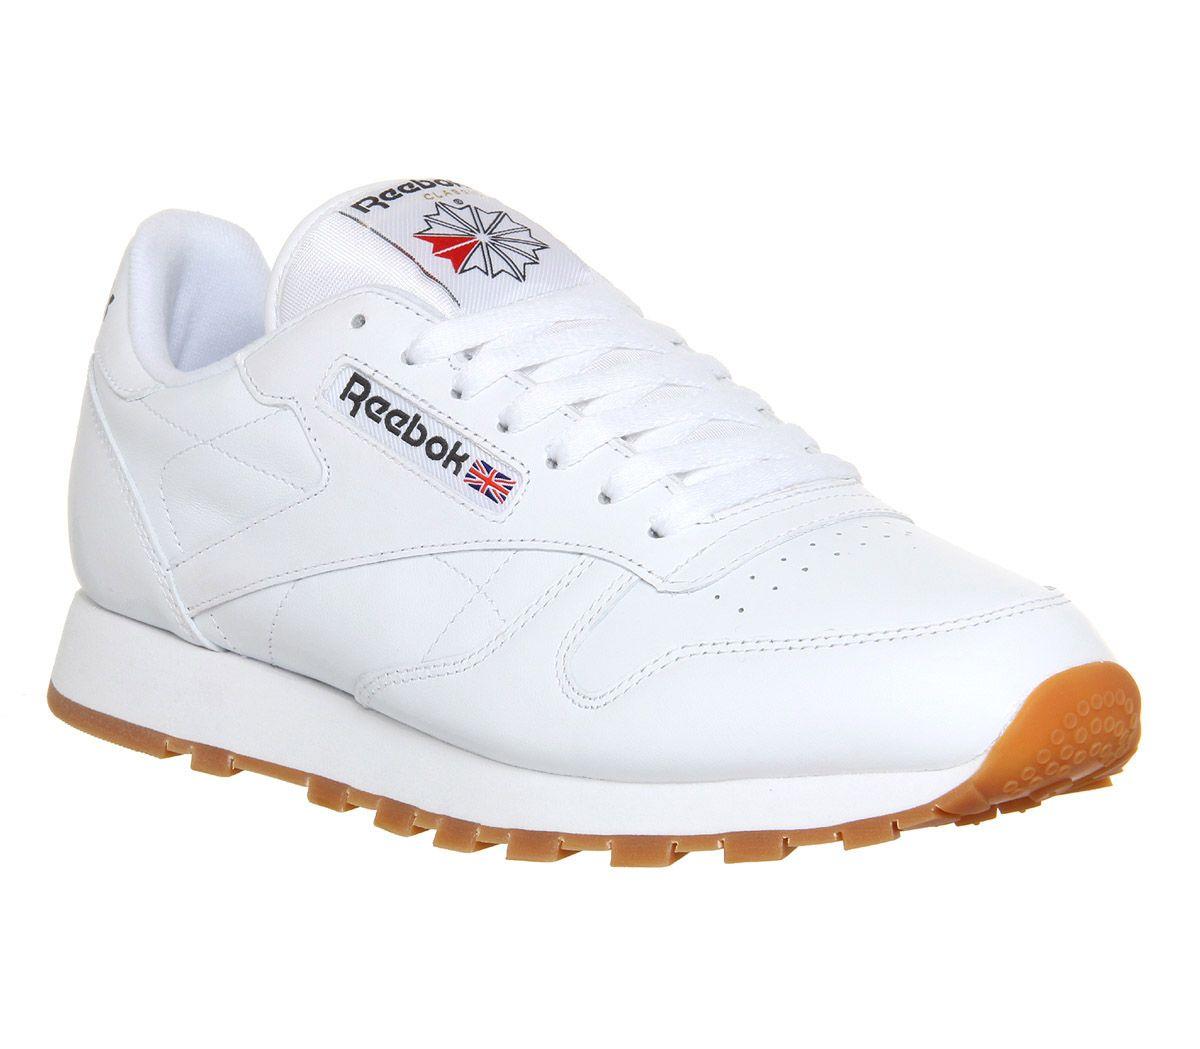 b48fb9ff84437 Reebok Cl Leather White Gum - Unisex Sports